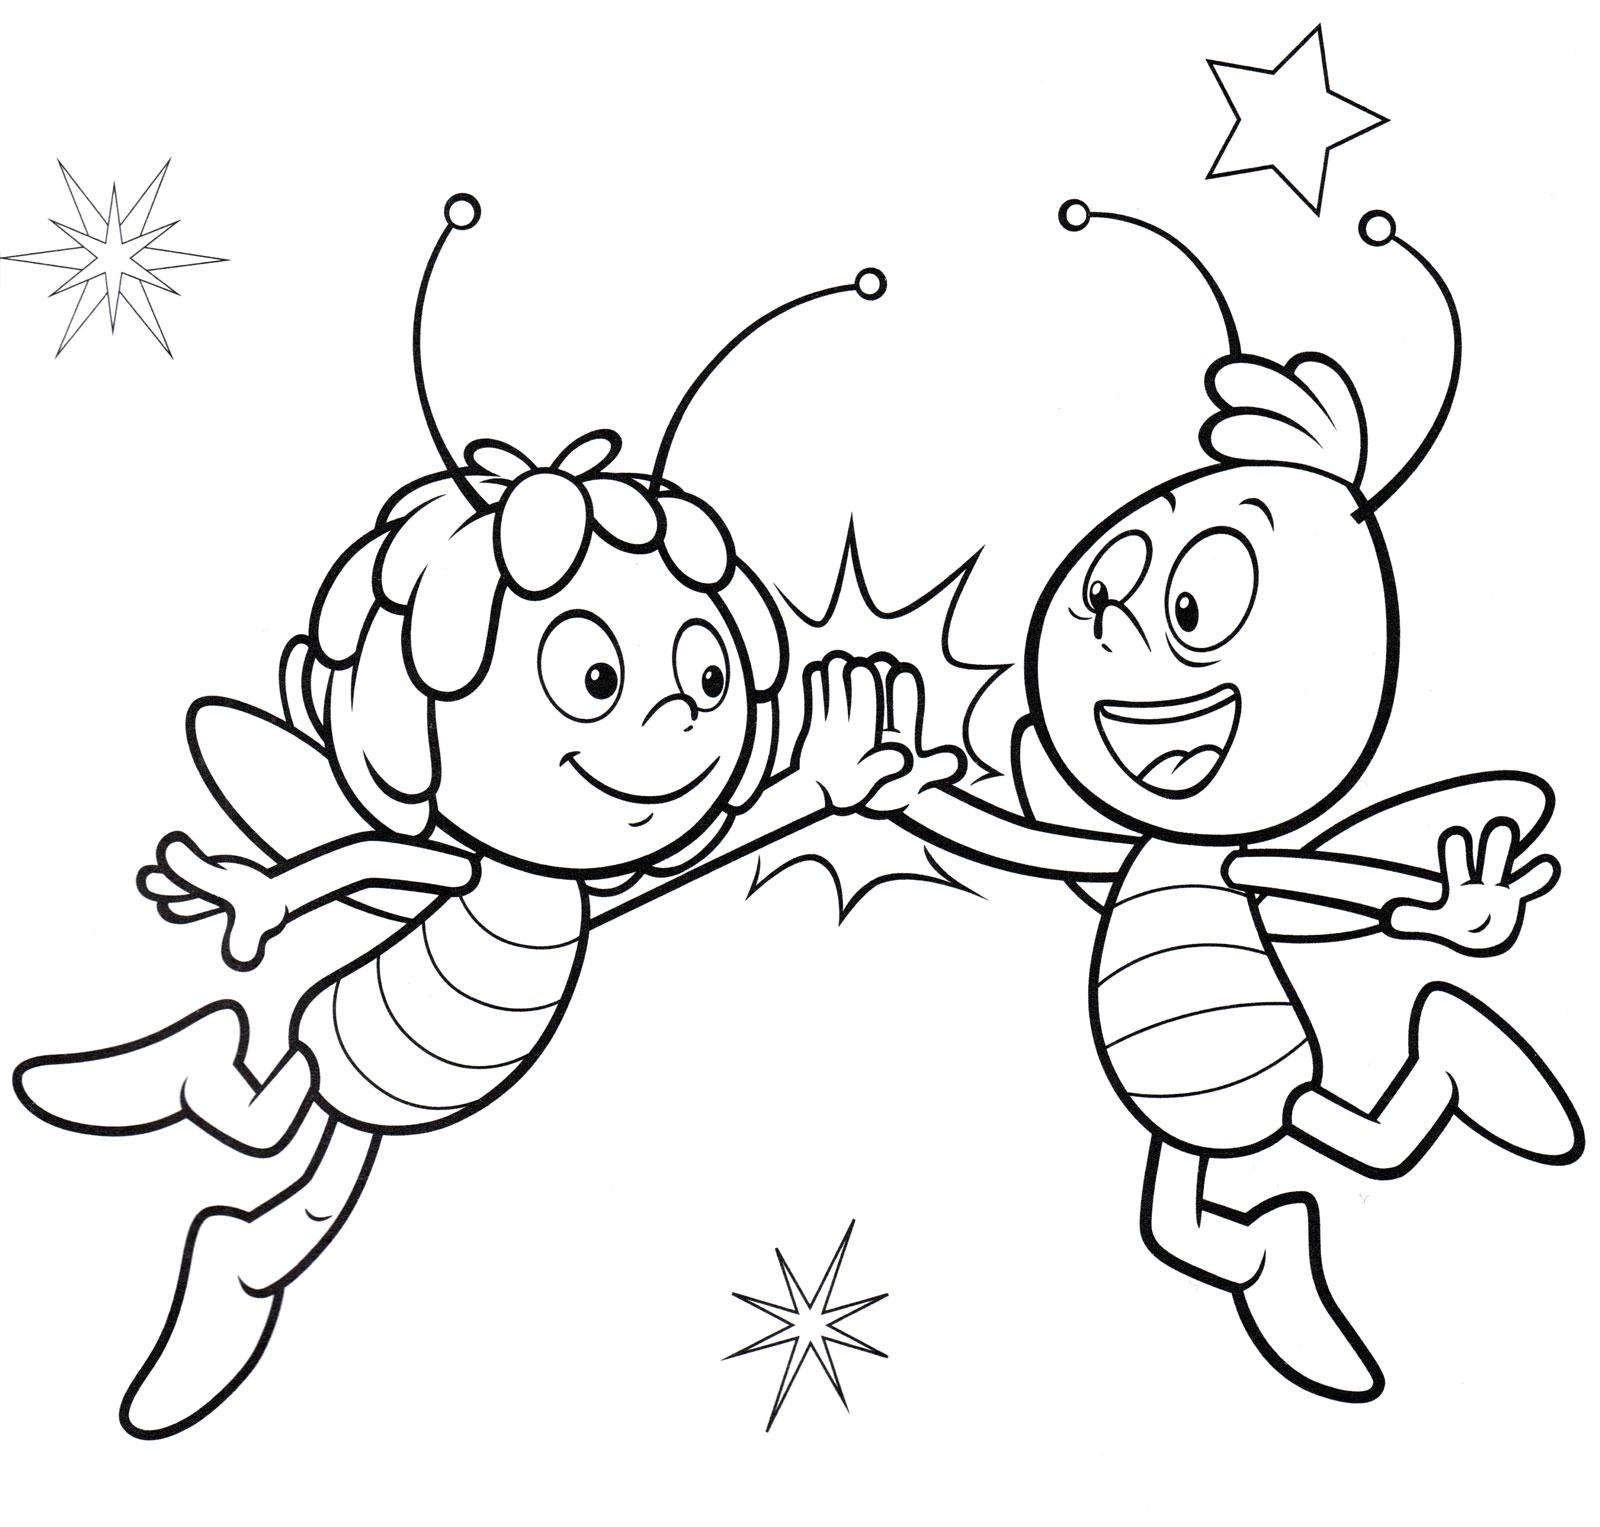 Раскраска Пчелки друзья | Раскраски Пчелка Майя